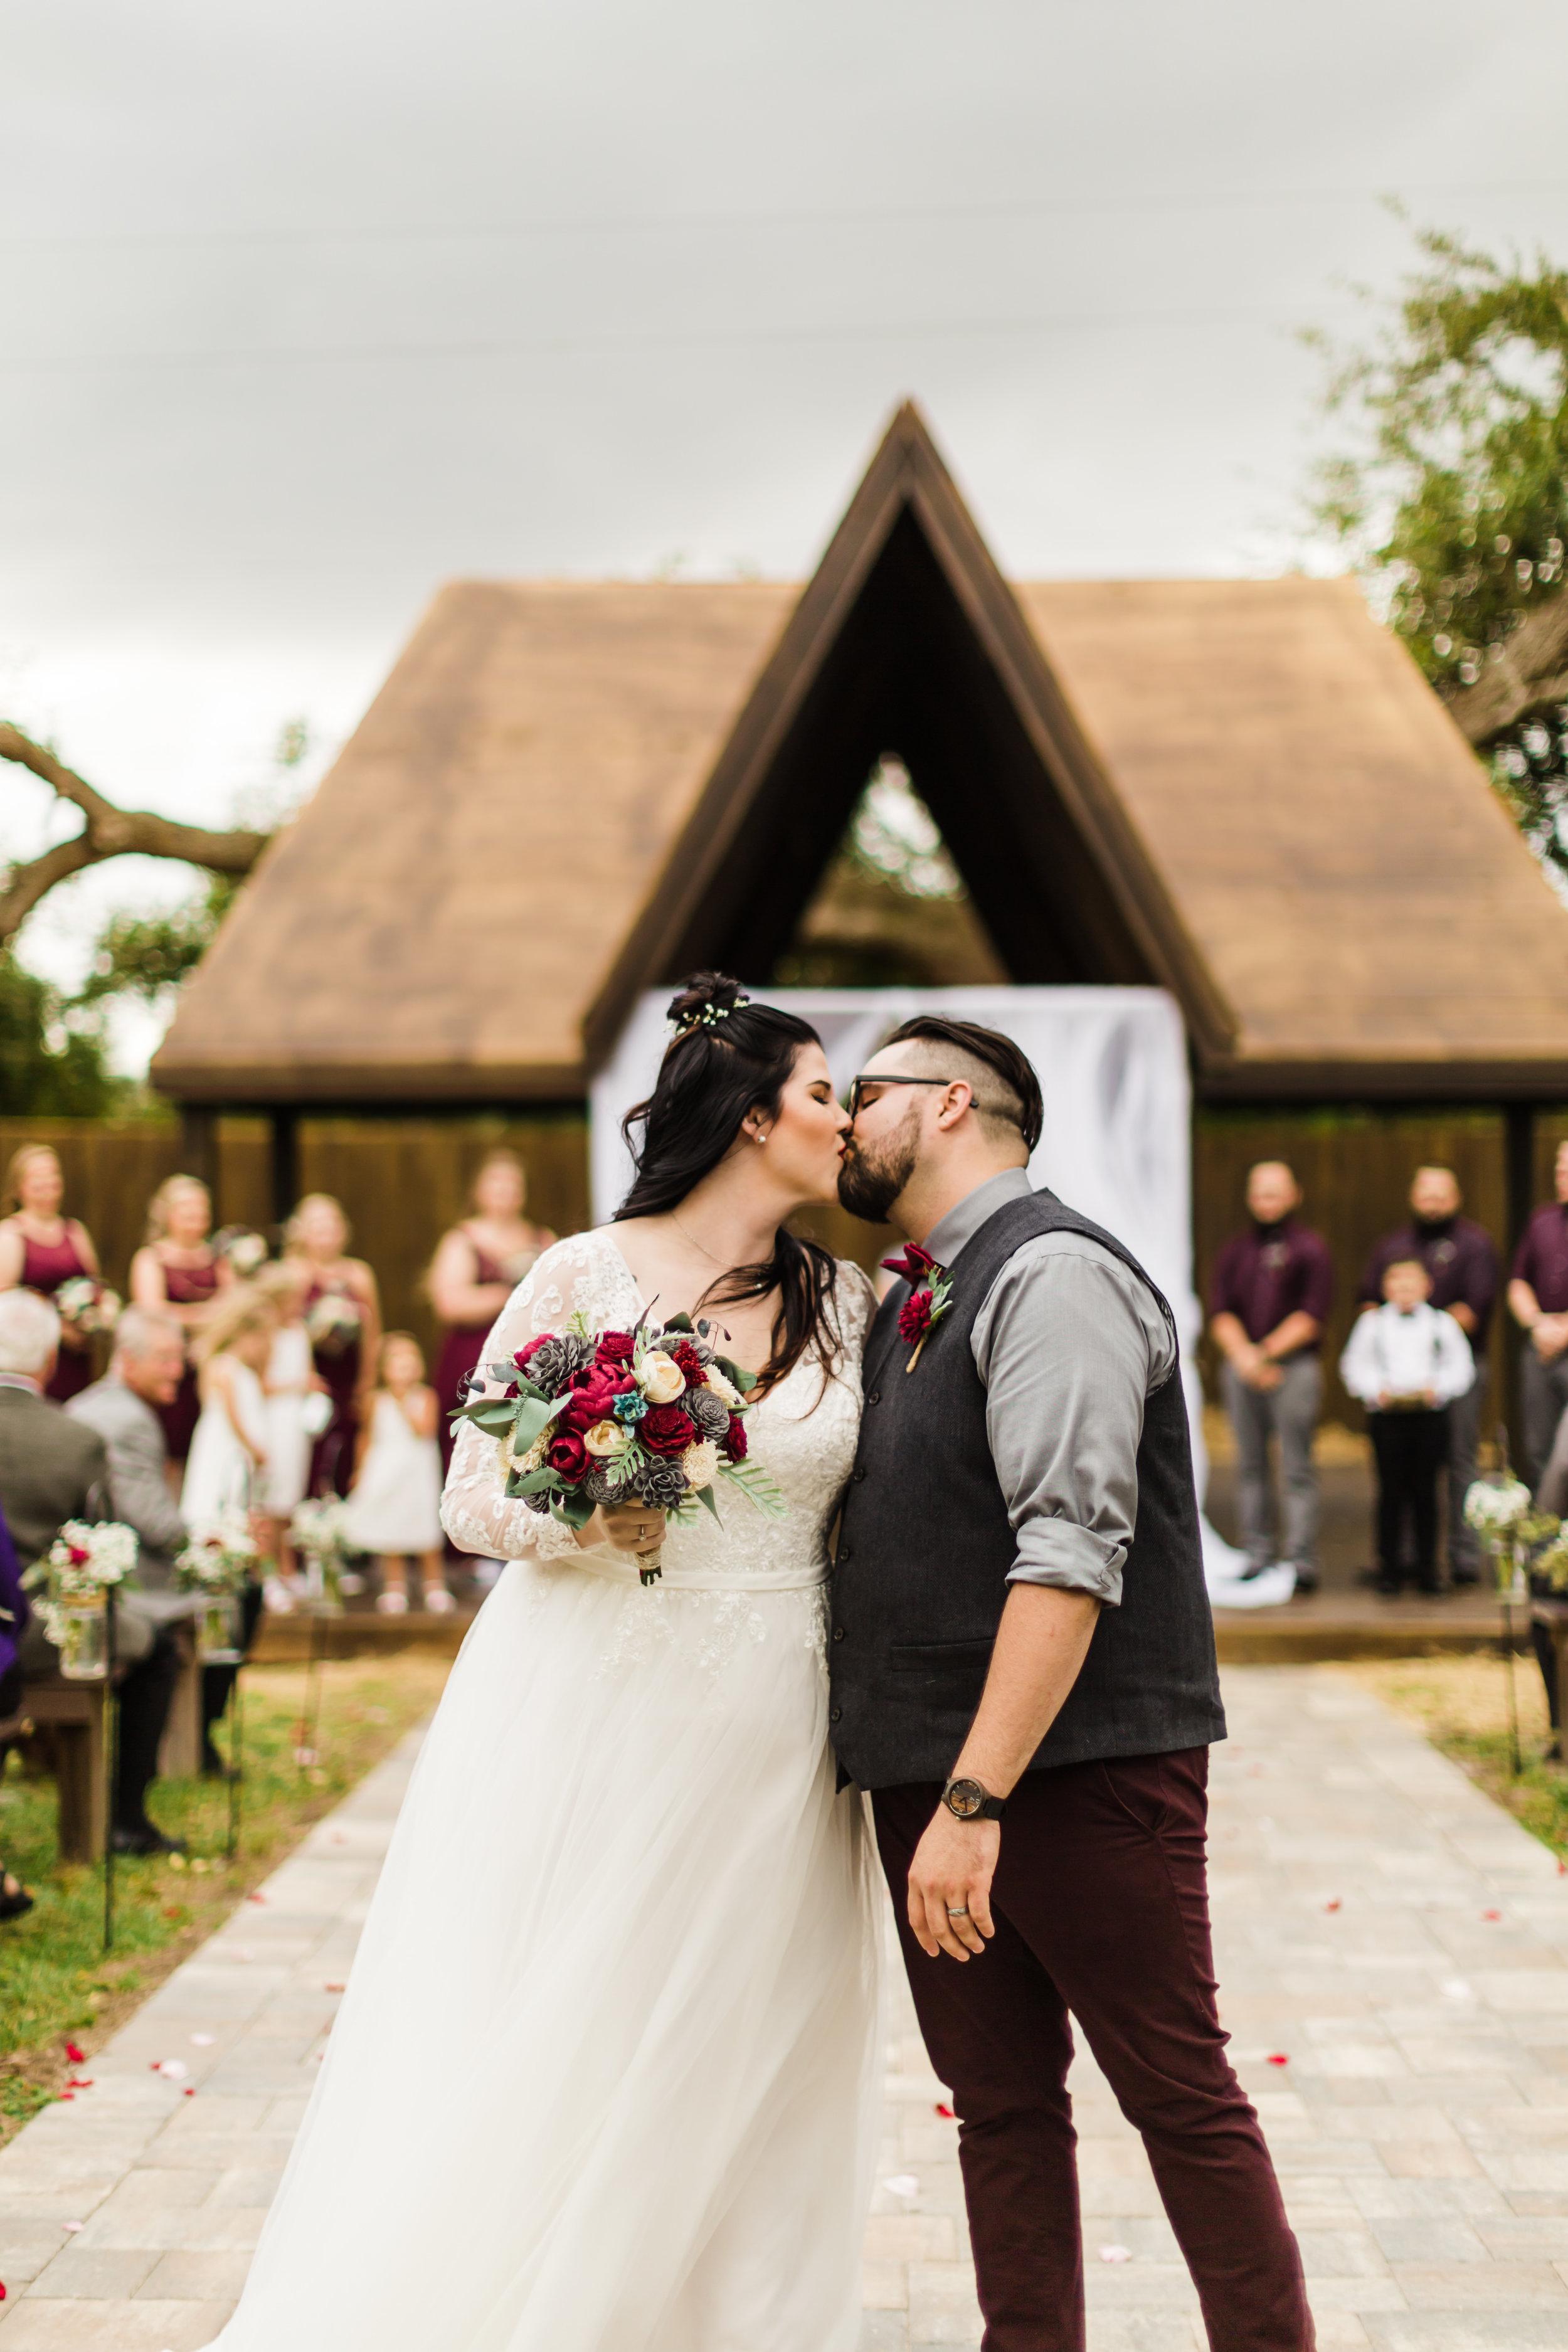 2018.11.11 Paige and TJ Enchanting Barn Wedding (272 of 841).jpg